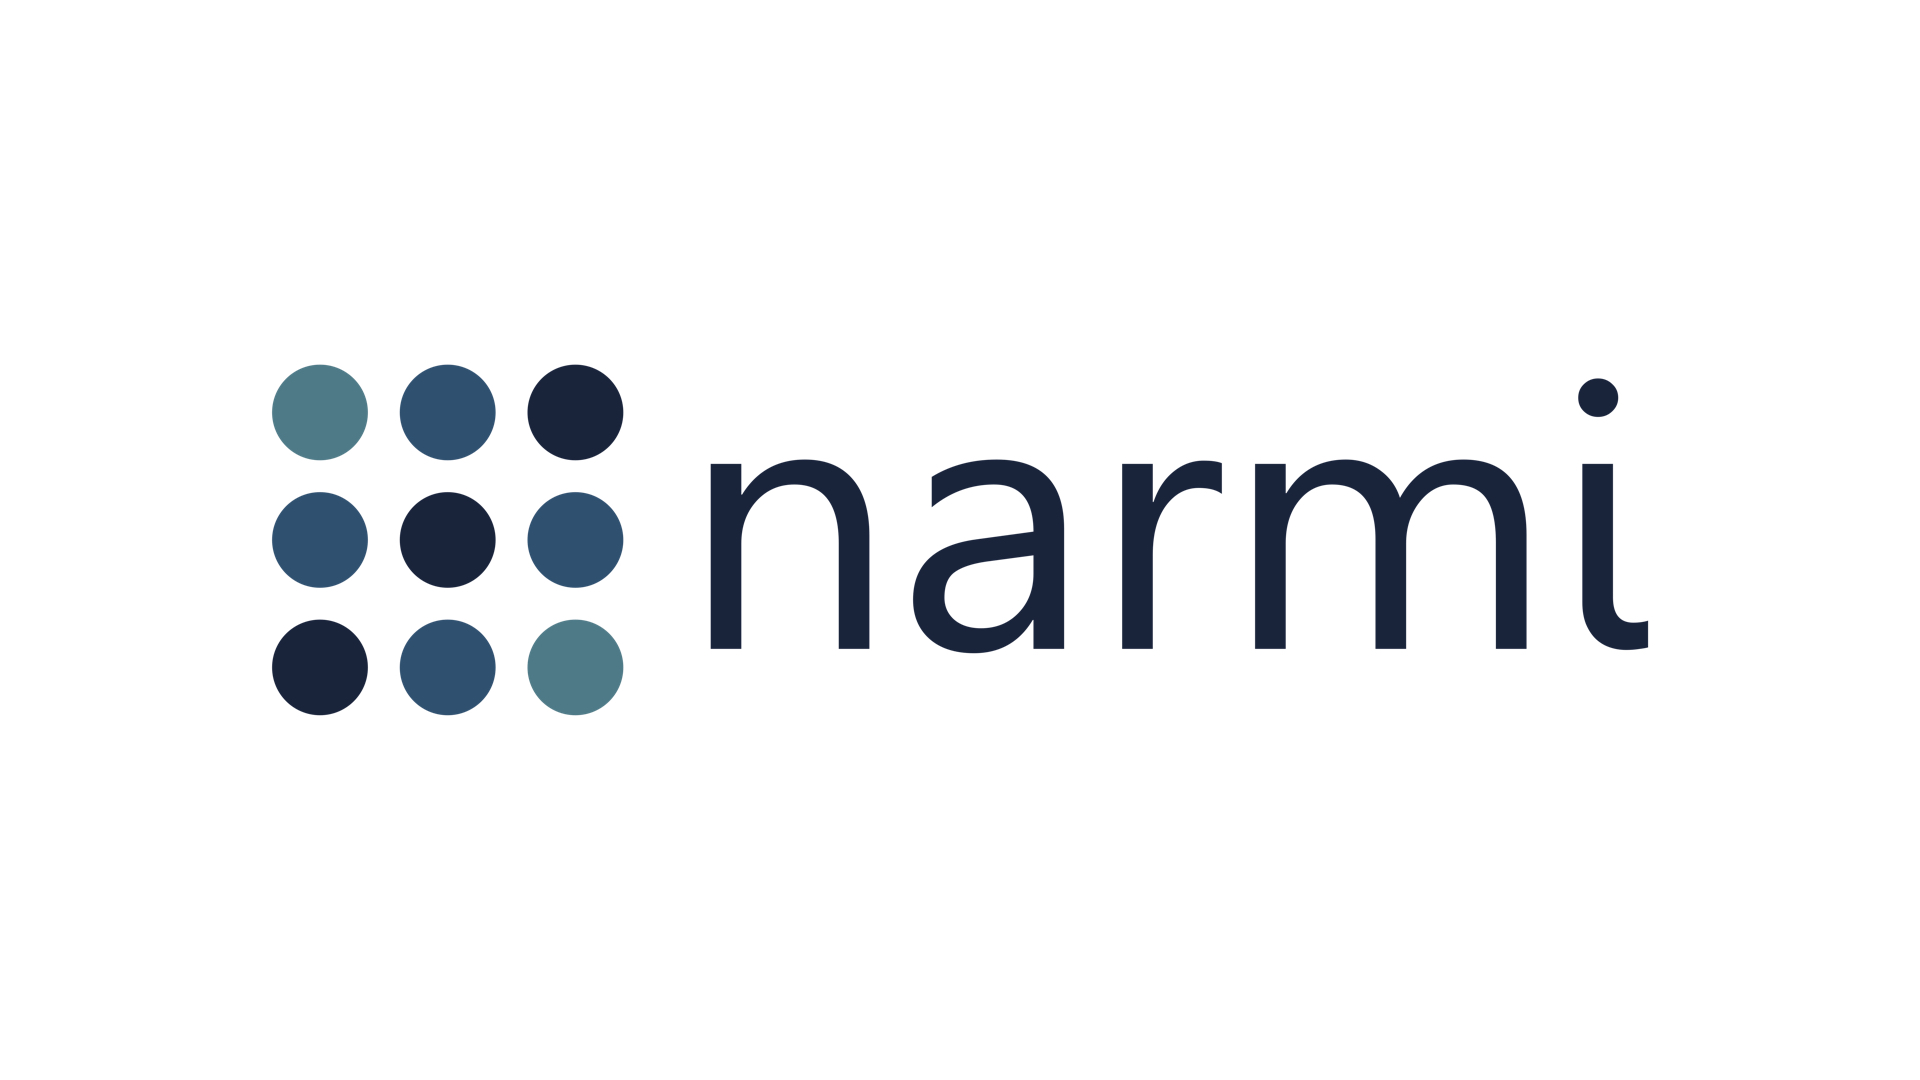 Narmi · fintechsandbox/project-sandcastle Wiki · GitHub